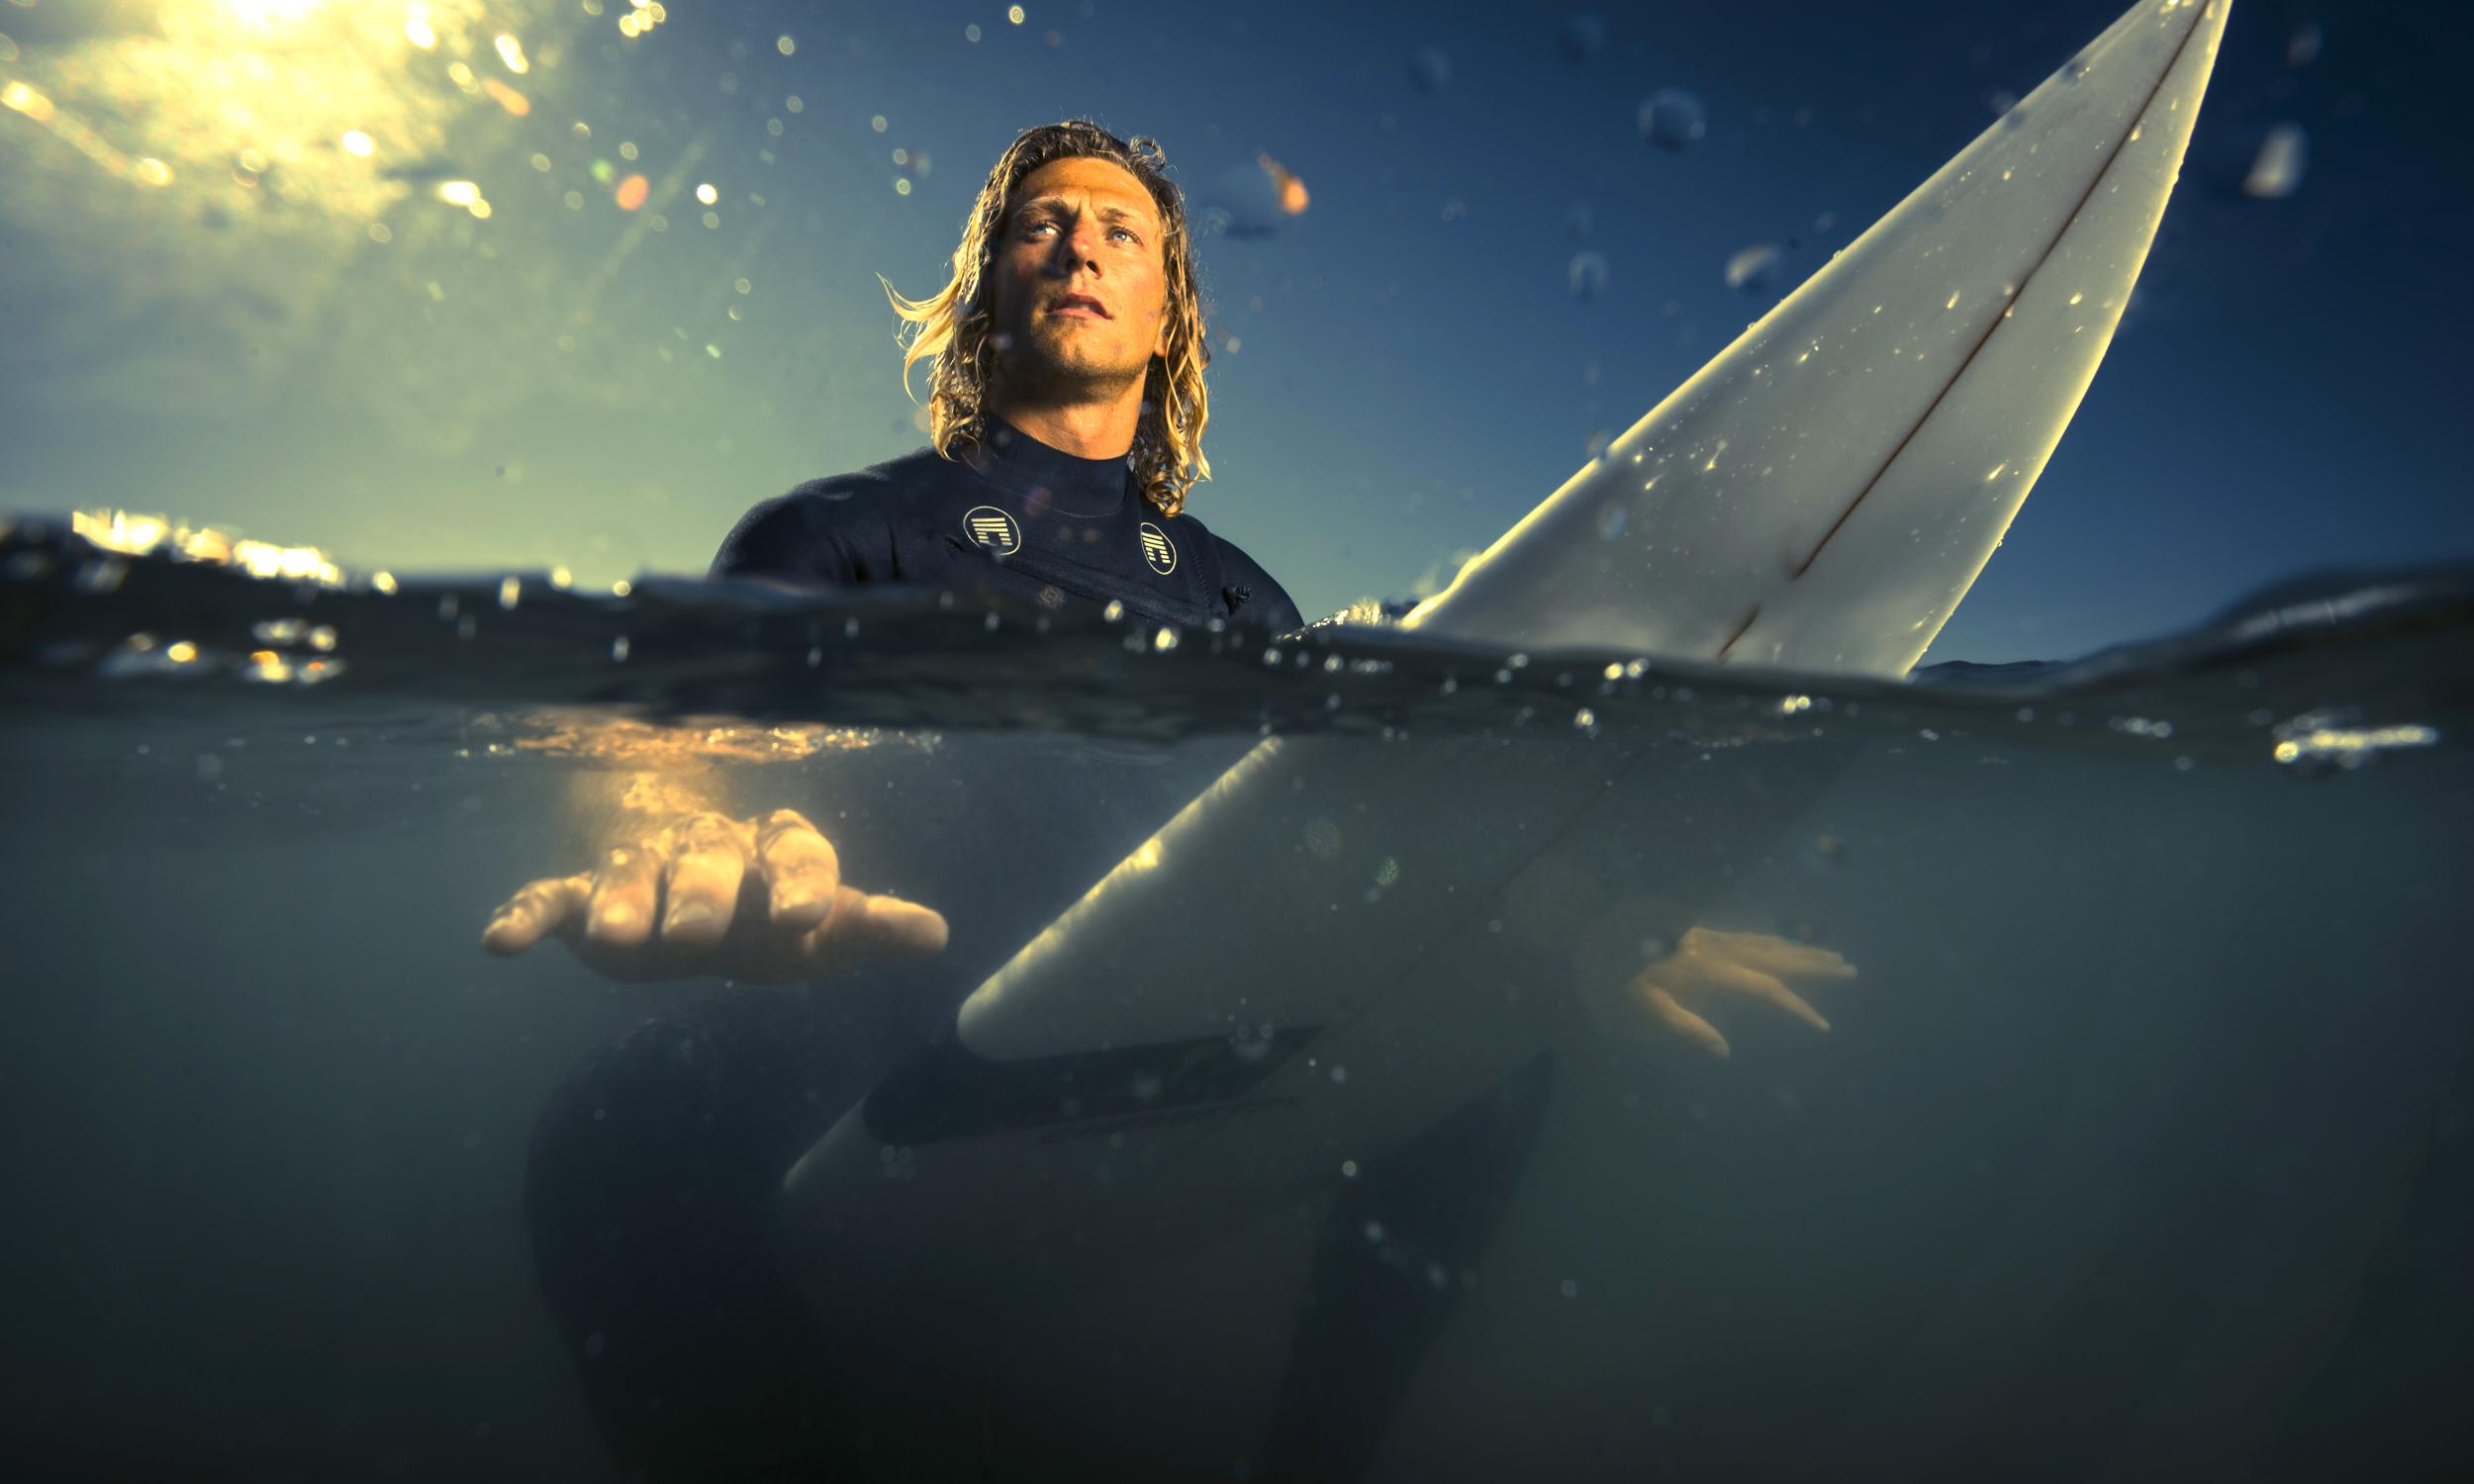 Surfer-5763.jpg